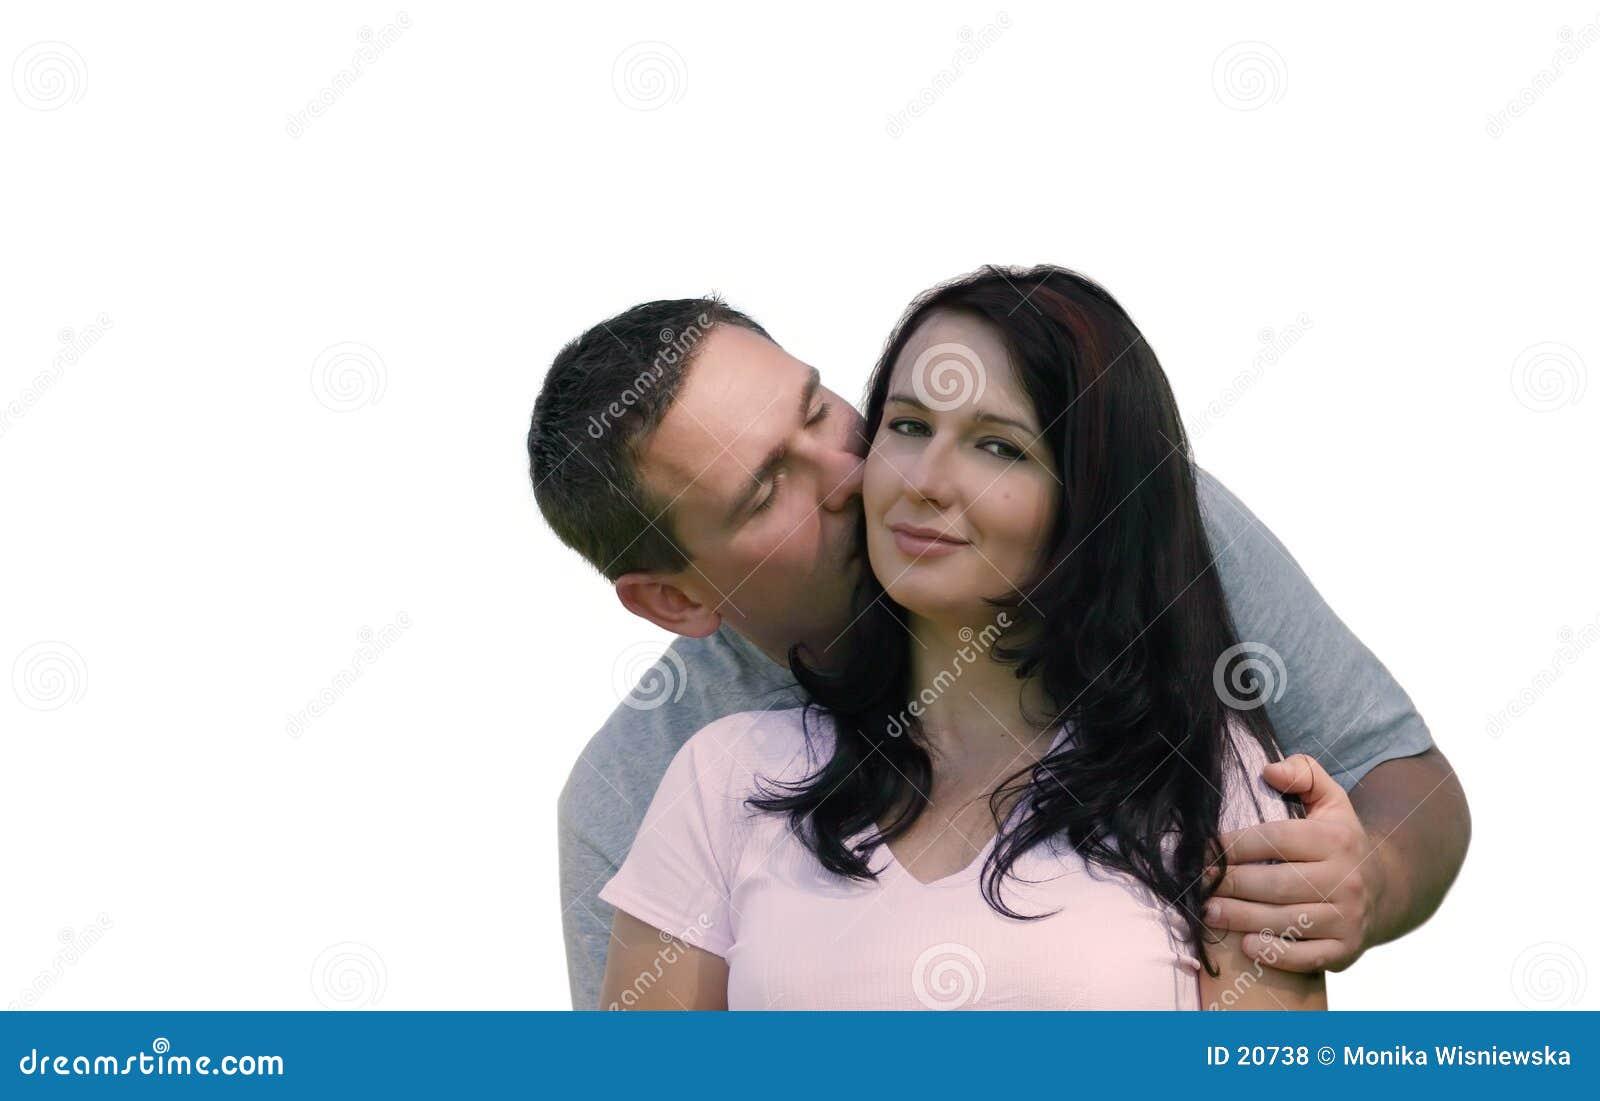 помадка людей поцелуя